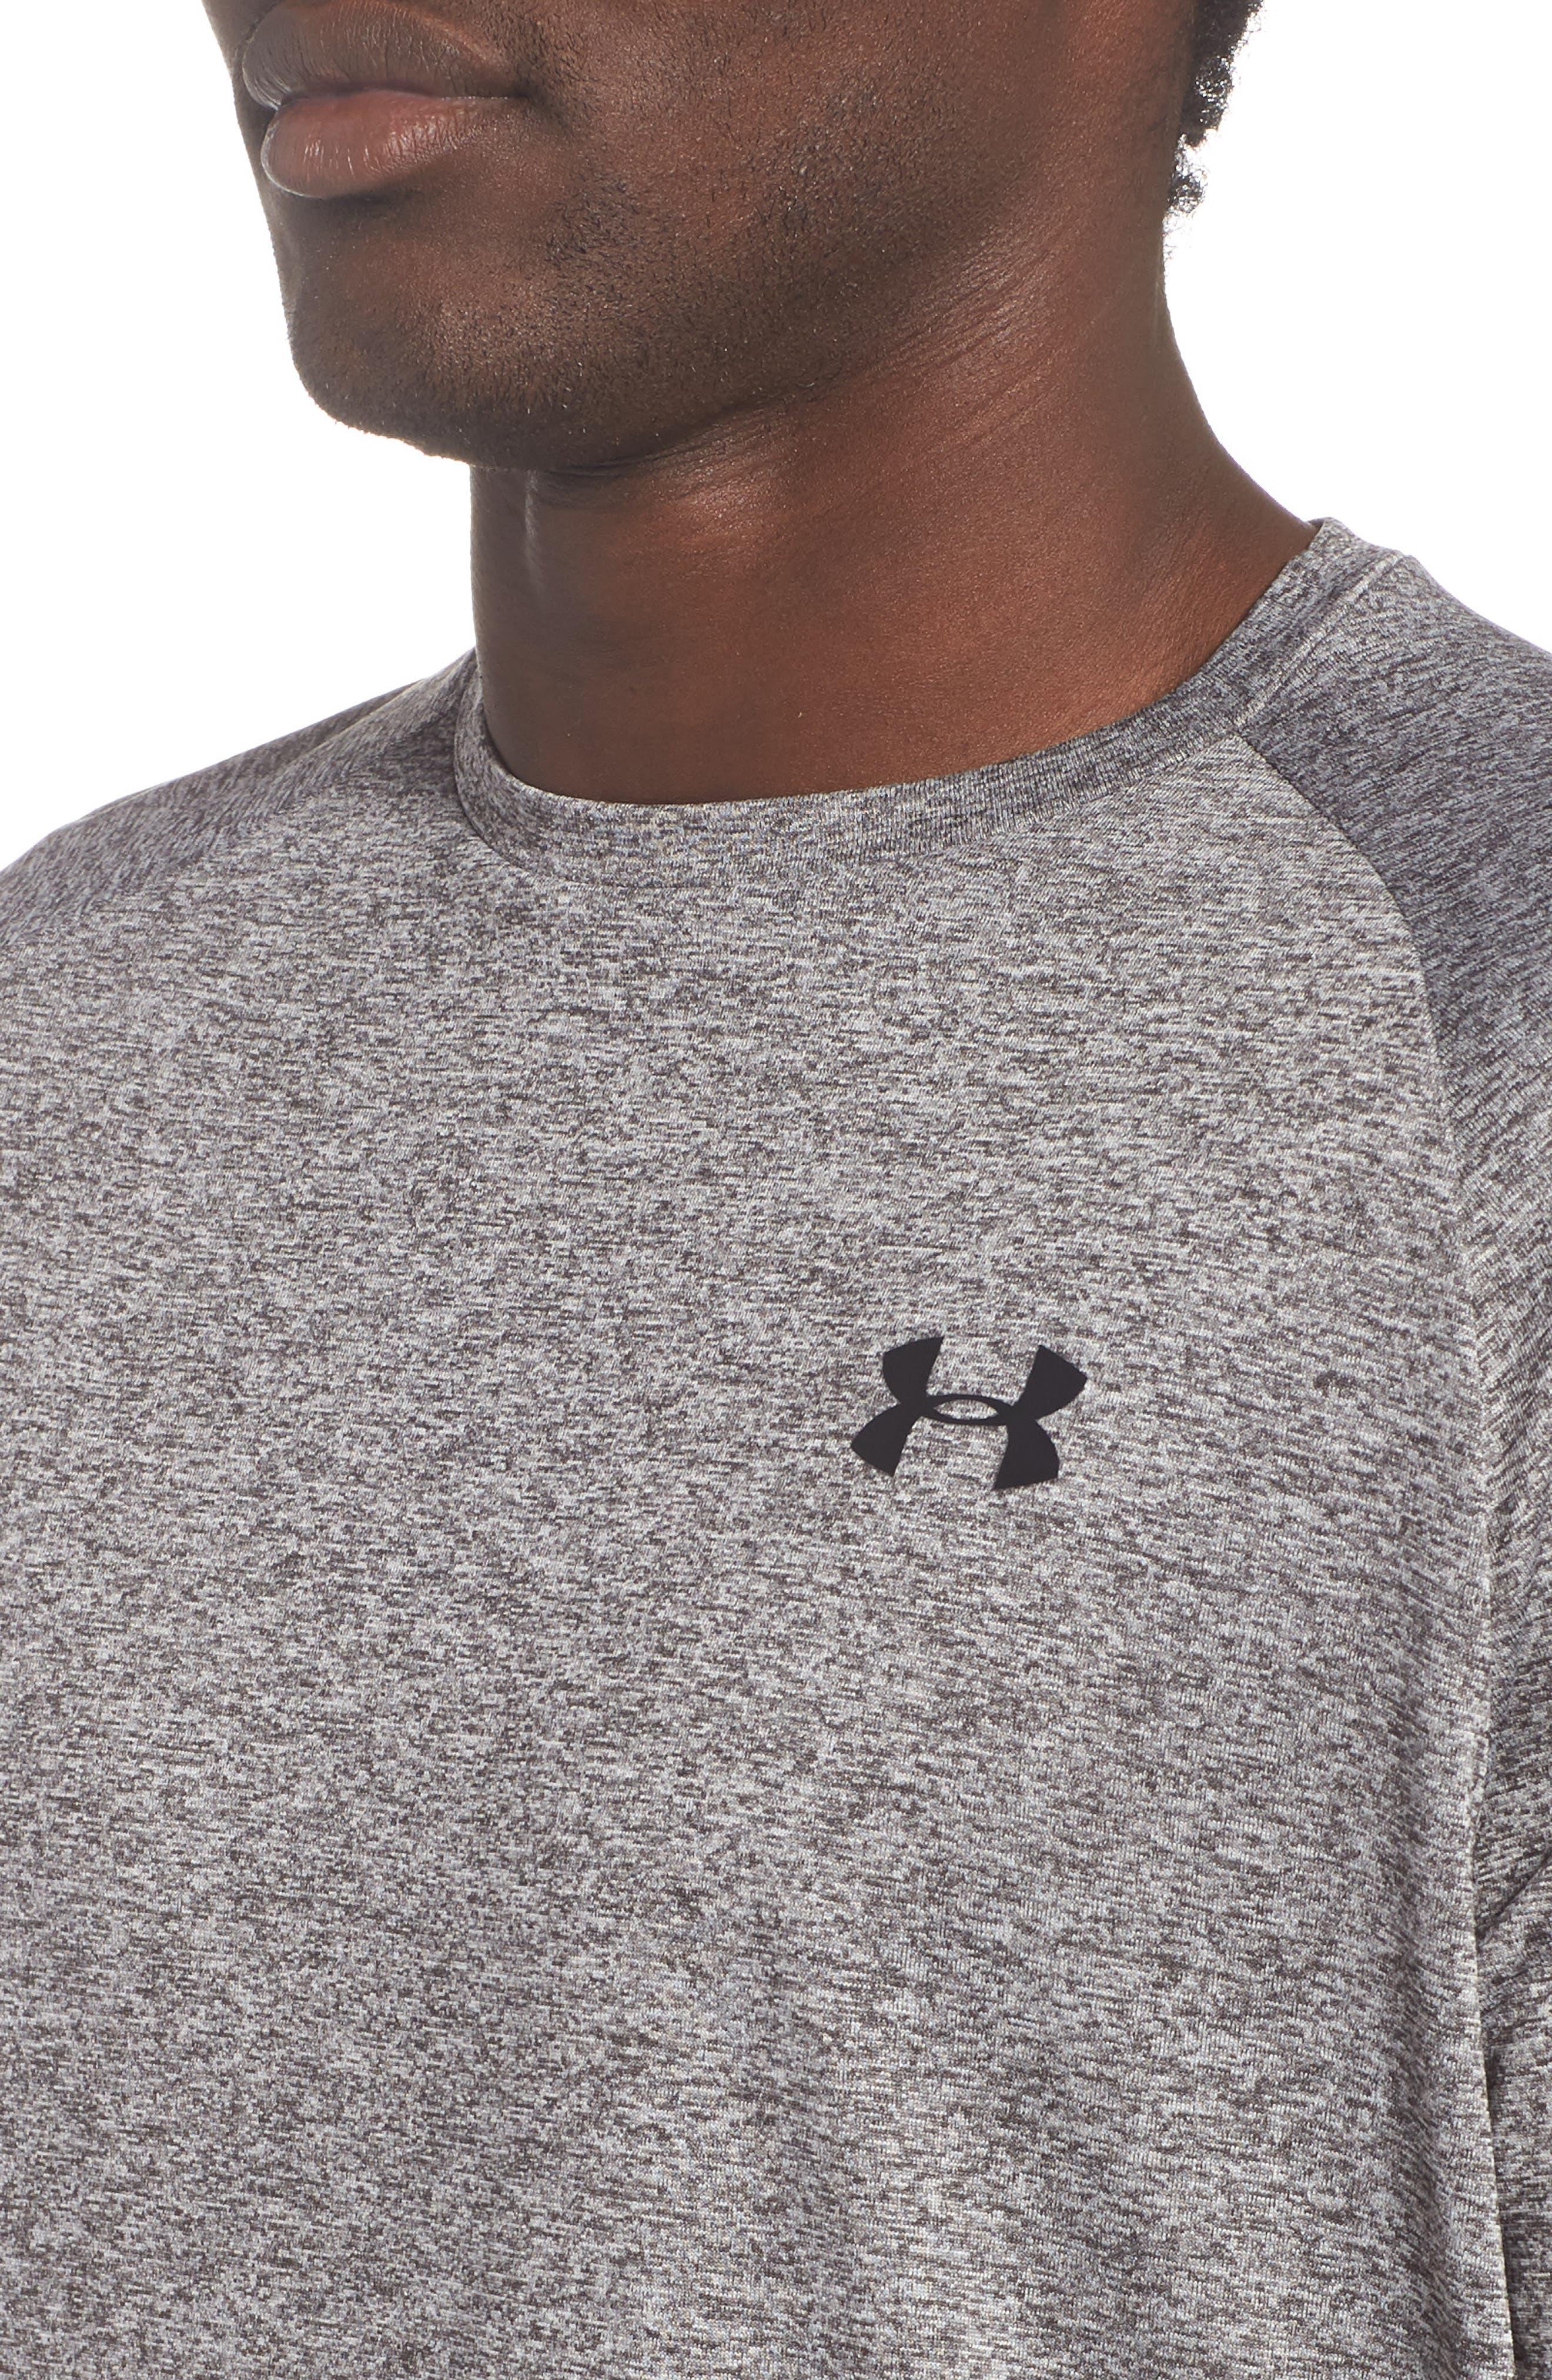 UA Tech<sup>™</sup> T-Shirt,                             Alternate thumbnail 4, color,                             CHARCOAL LIGHT HEATHER